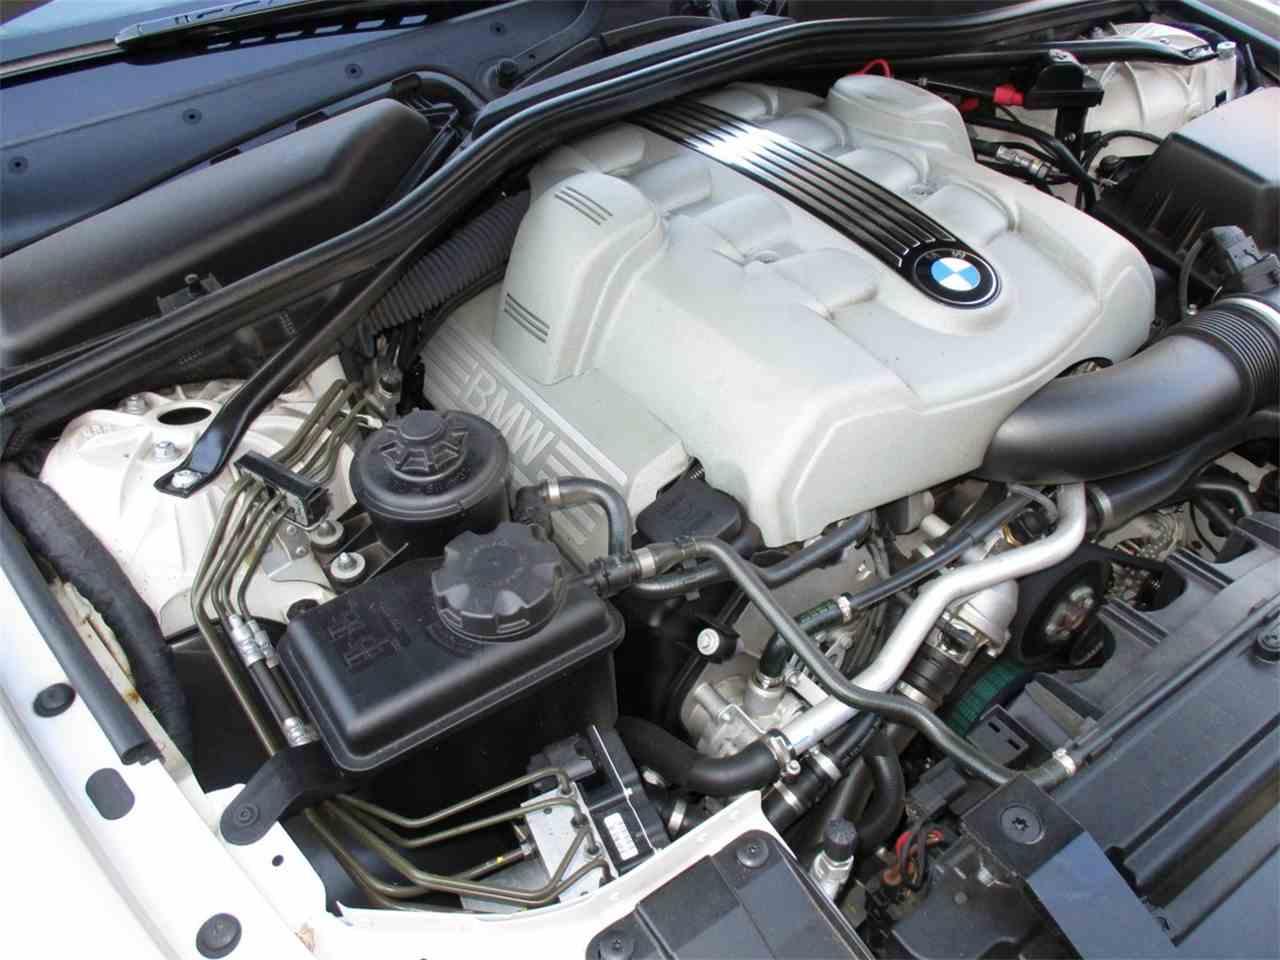 BMW Ci For Sale ClassicCarscom CC - Bmw 645ci engine